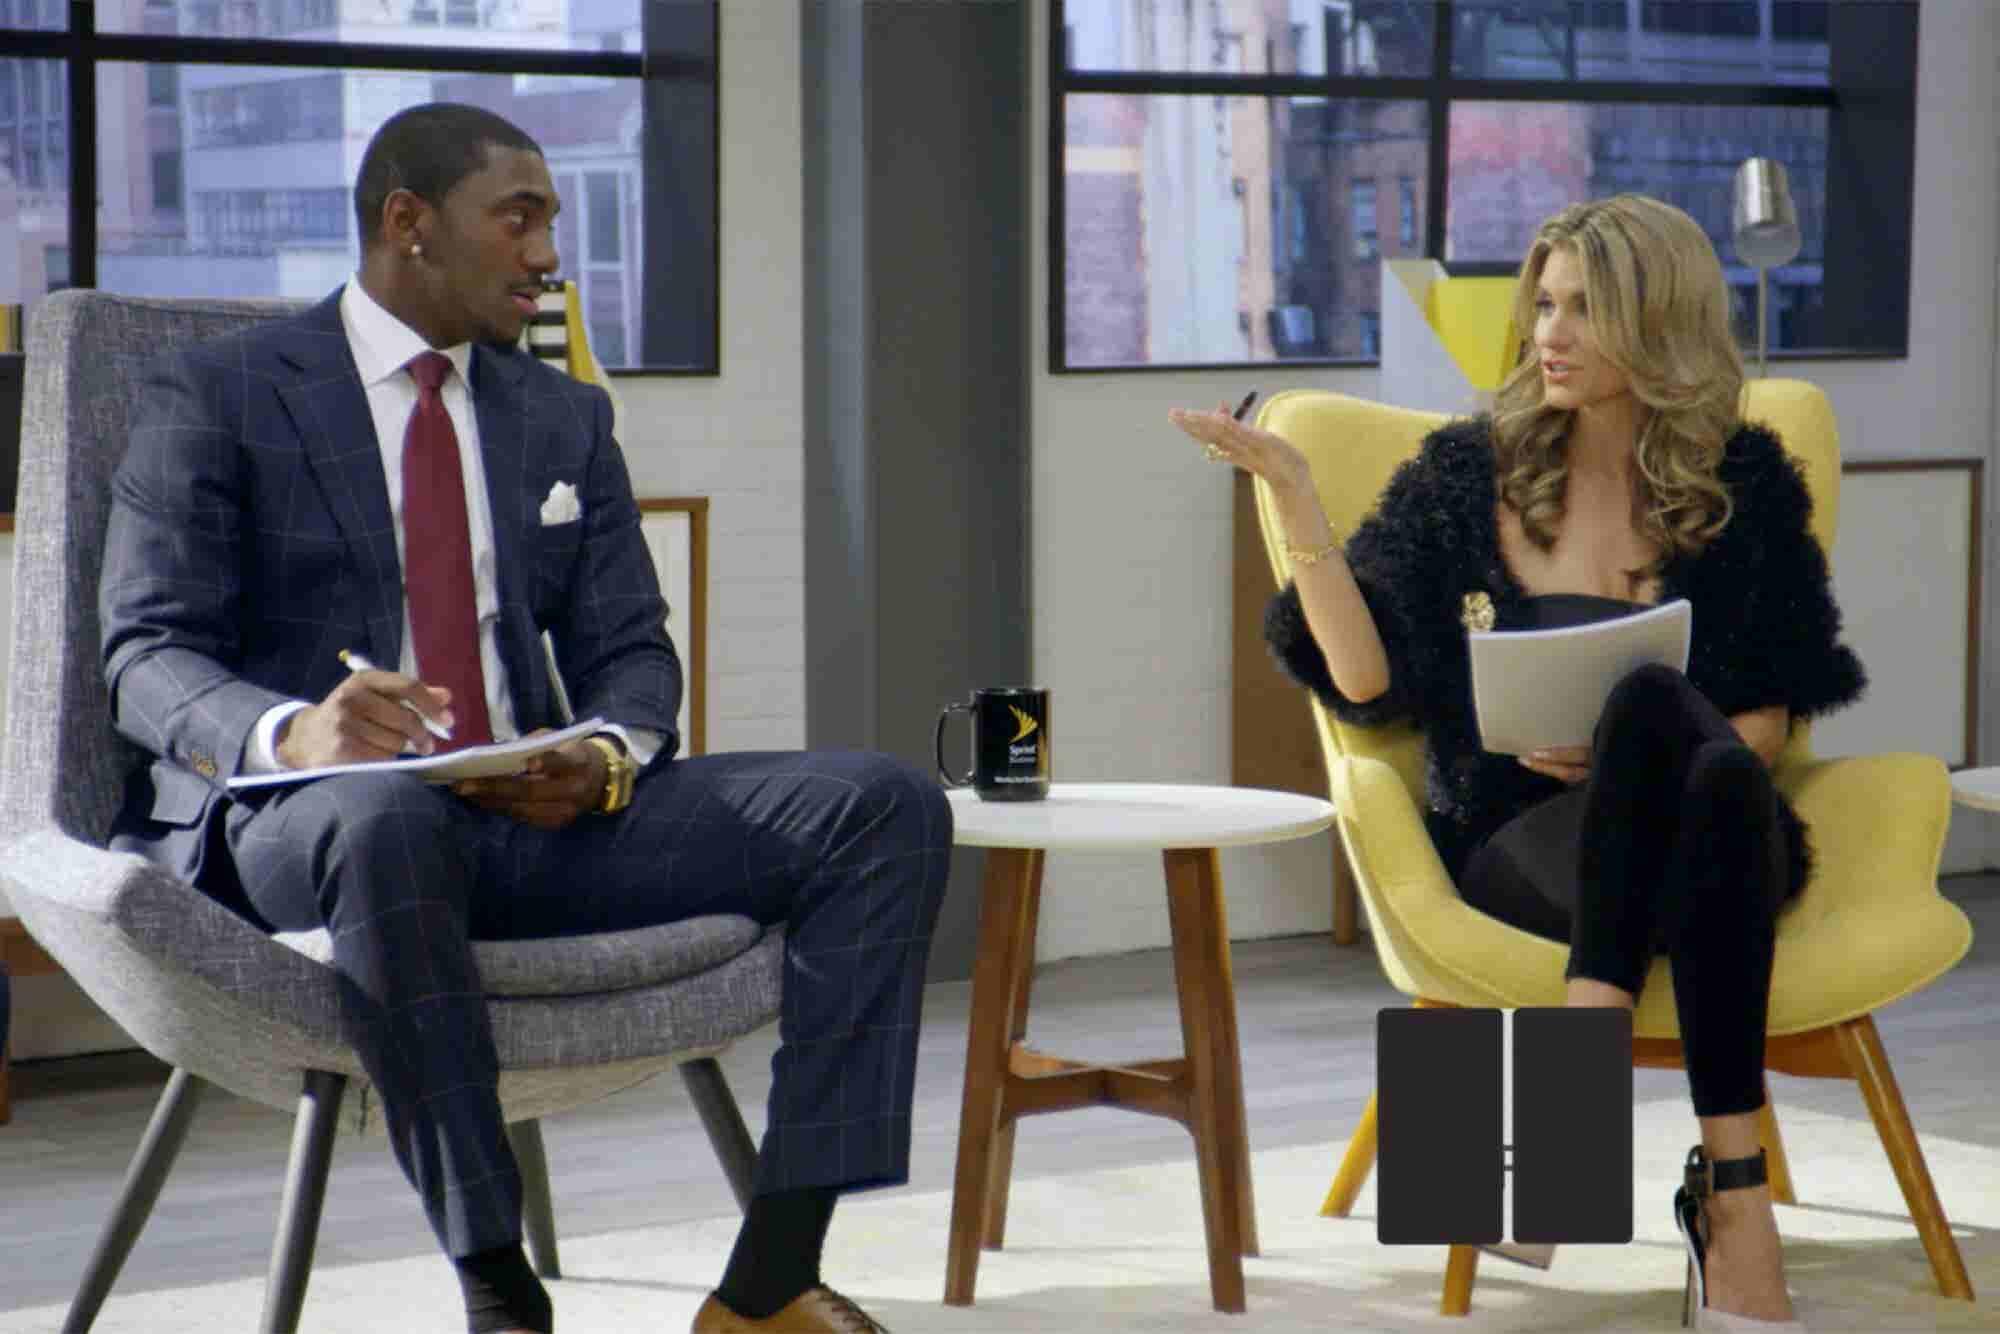 Entrepreneur Elevator Pitch Season 2 Ep. 11: 'You Don't Need Us'